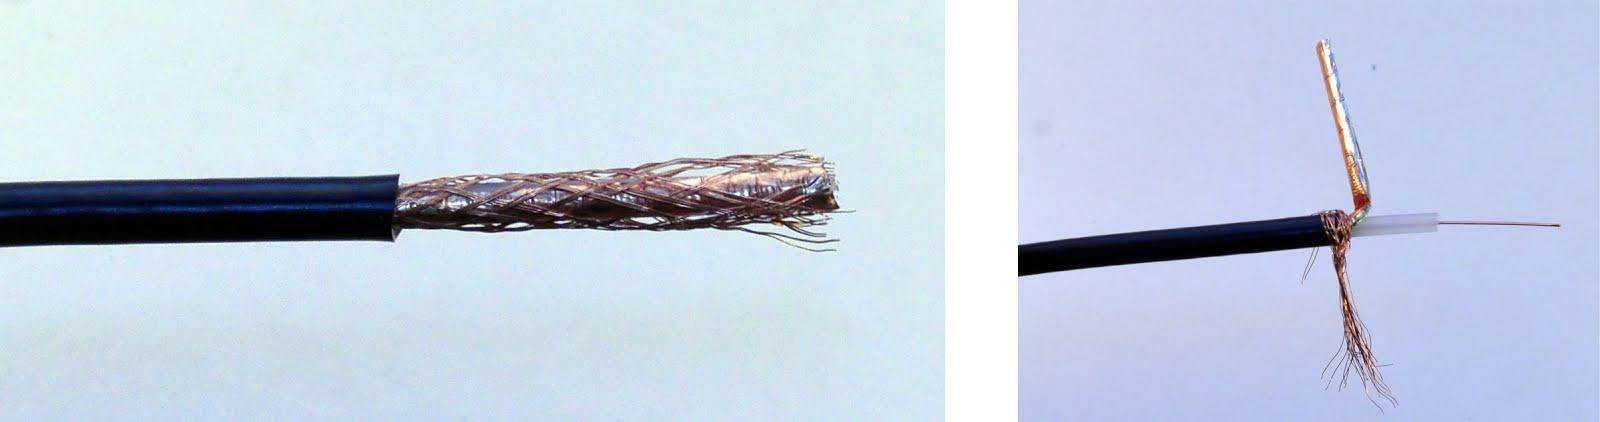 Review: Nooelec Rattlesnake 3-antenna kit | Radio for Everyone